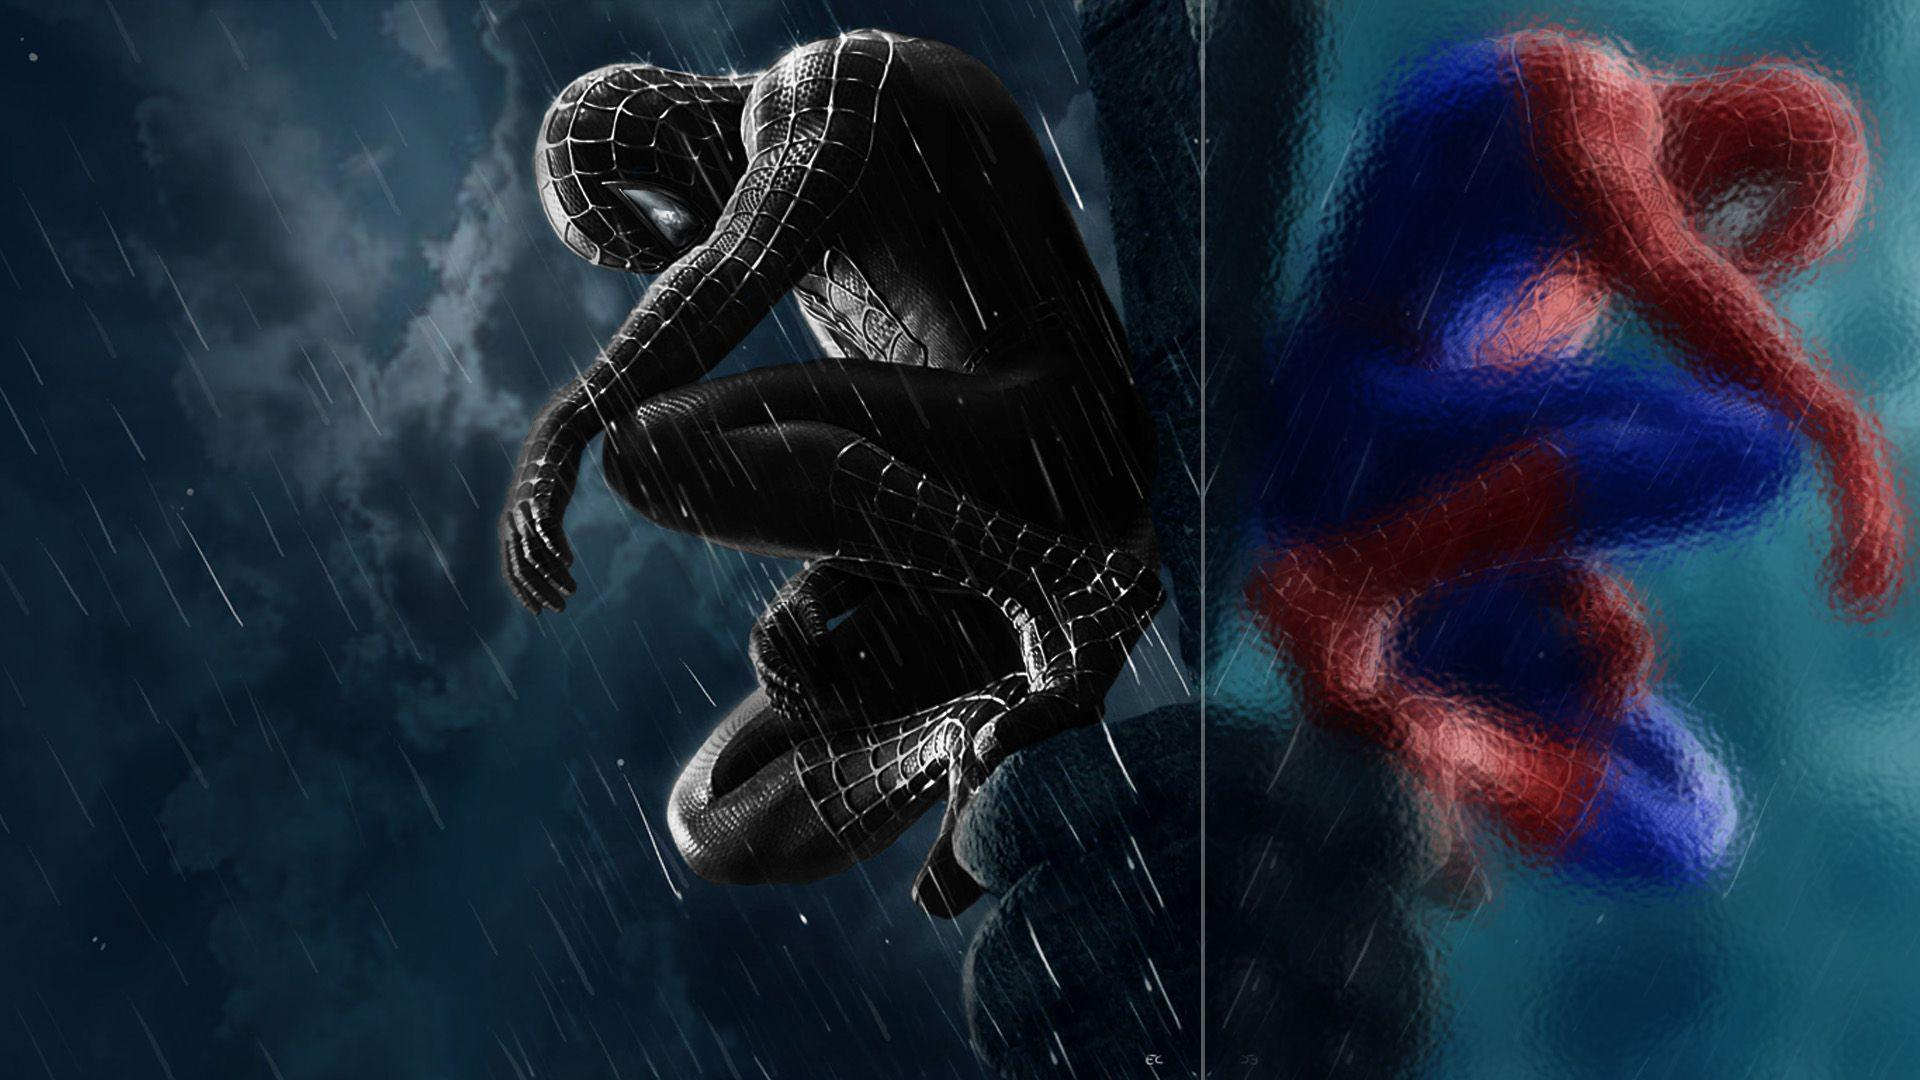 Spiderman 3 Wallpapers 3d Wallpaper Cave